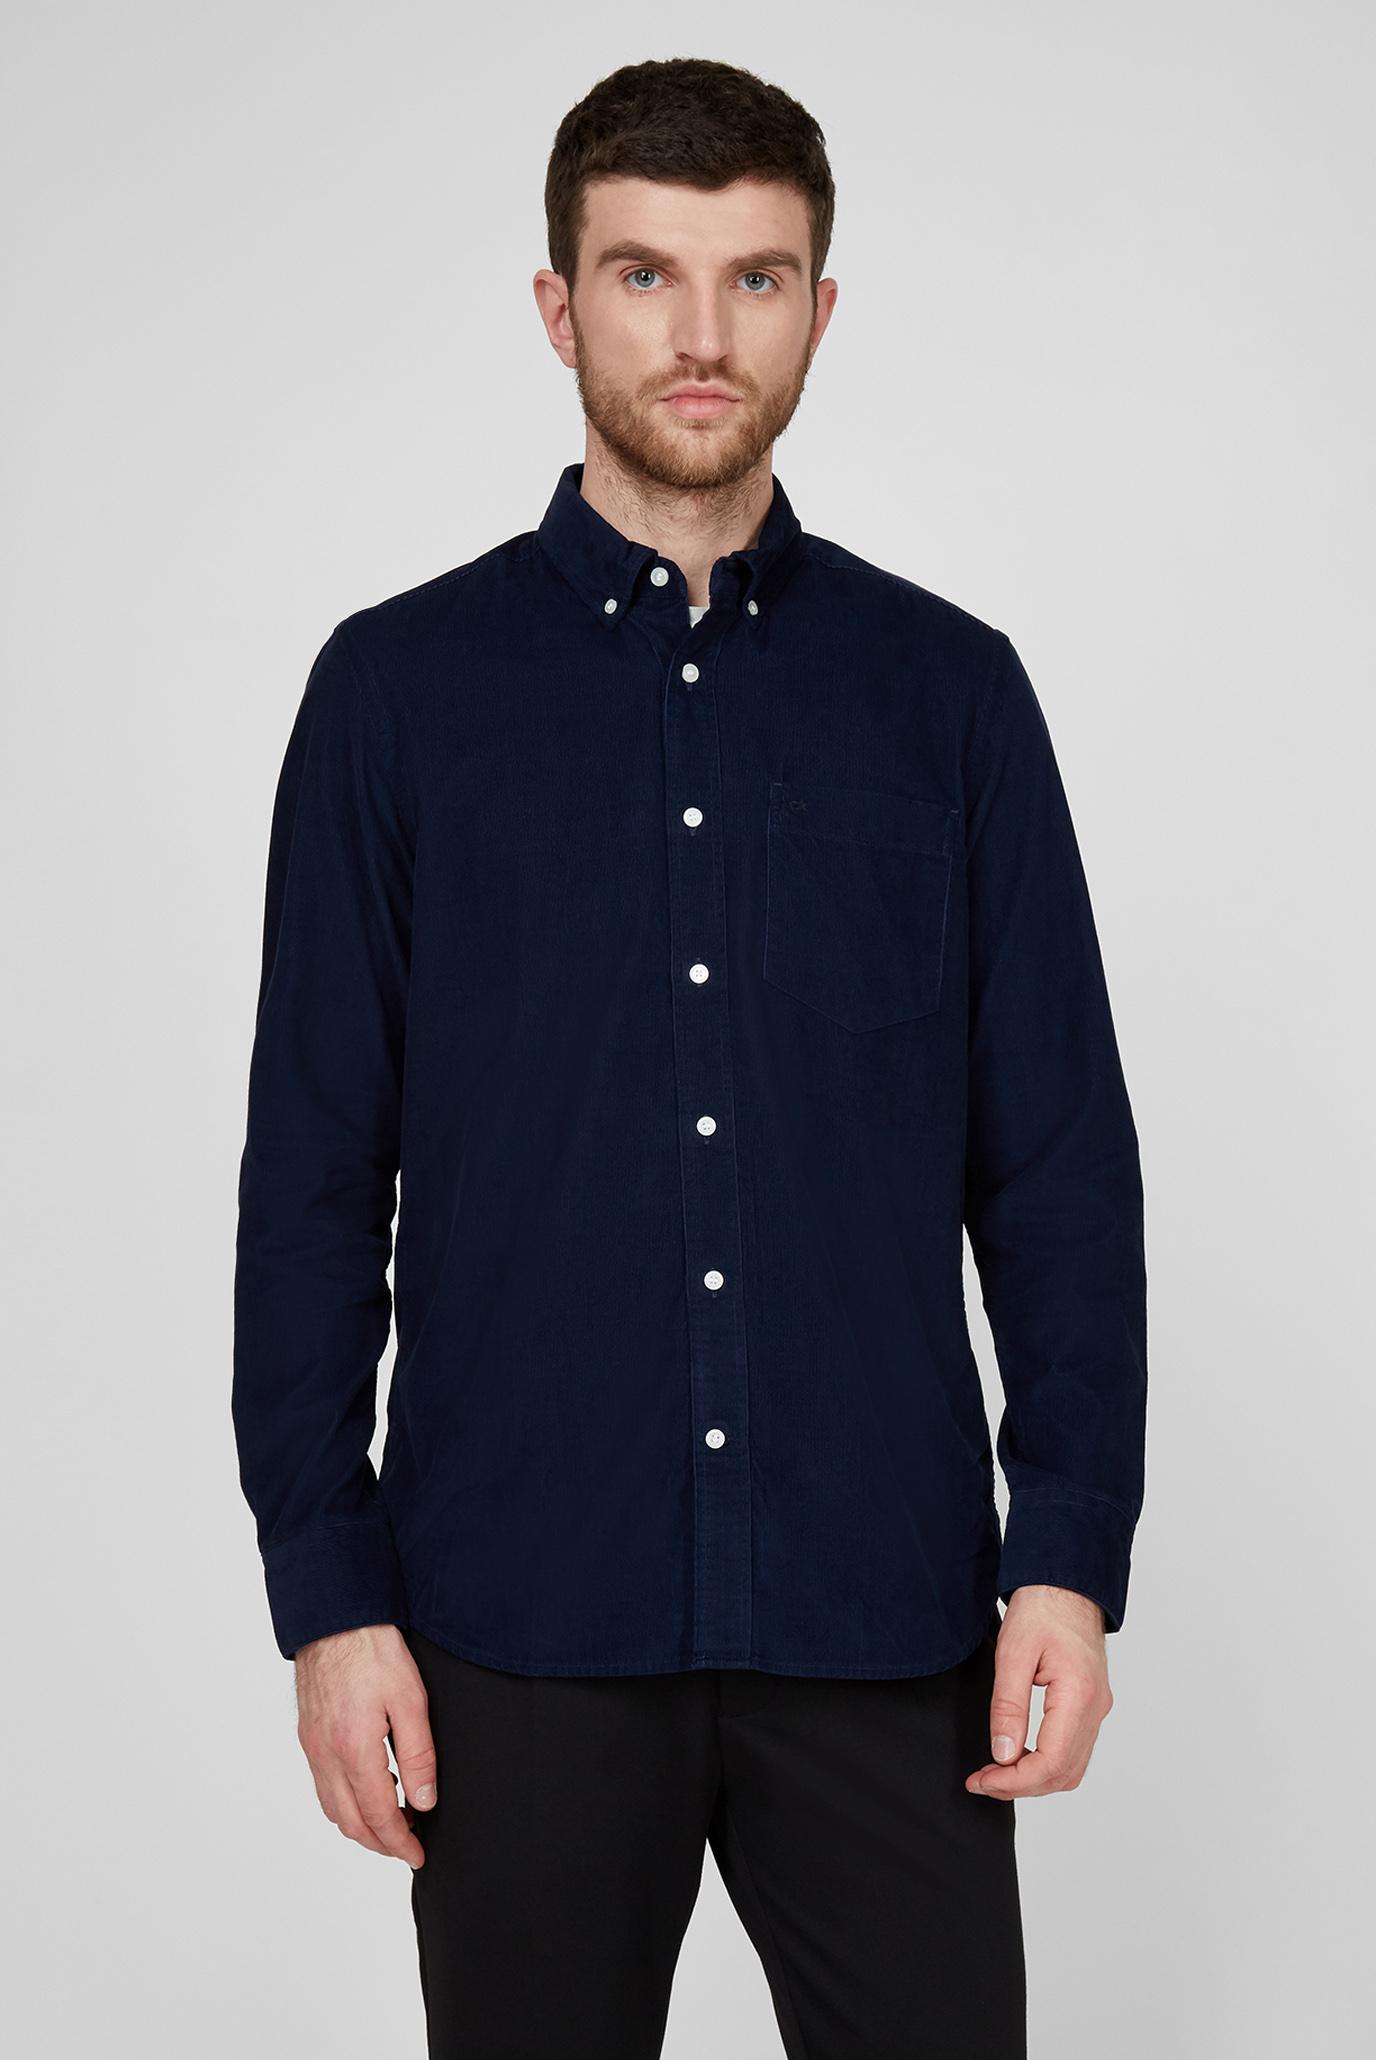 Мужская синяя вельветовая рубашка BUTTON DOWN FINE CORDUROY SHIRT 1